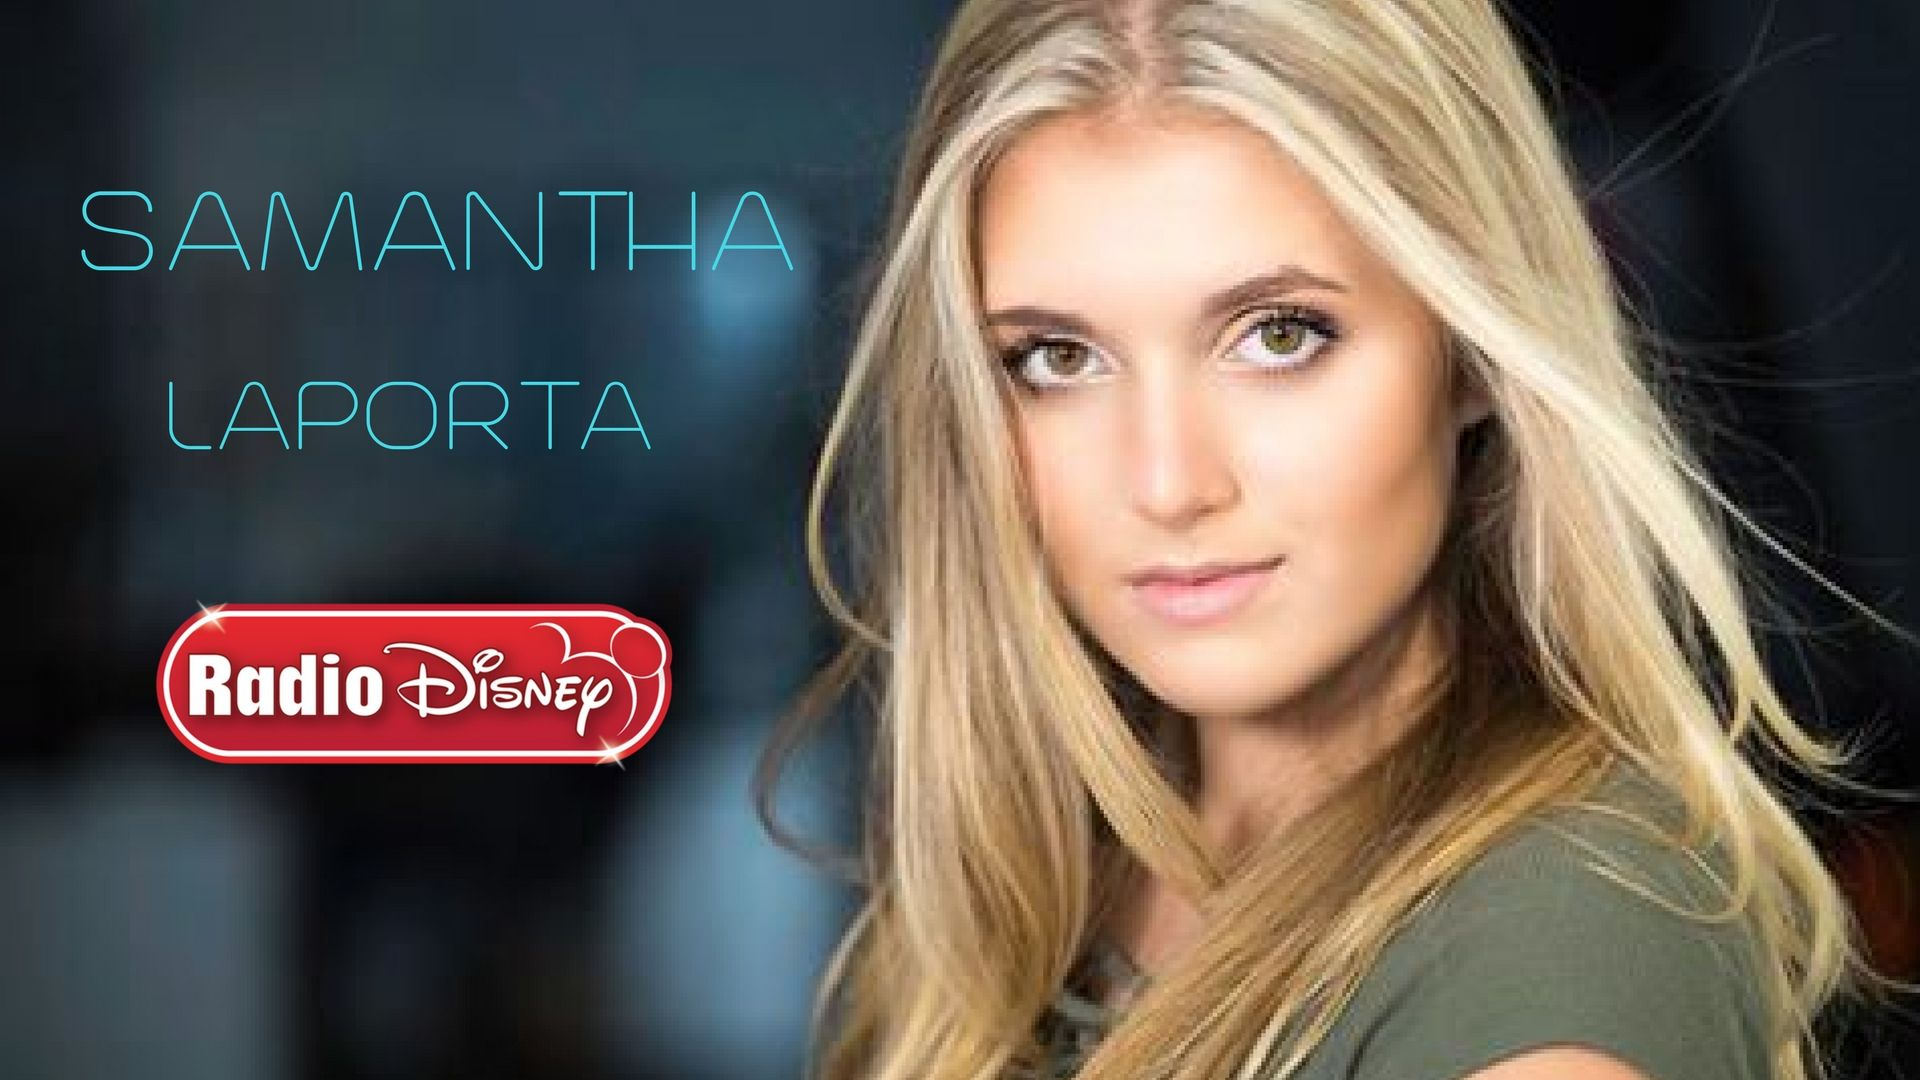 Radio Disney Artist Samantha LaPorta has spent the over 15